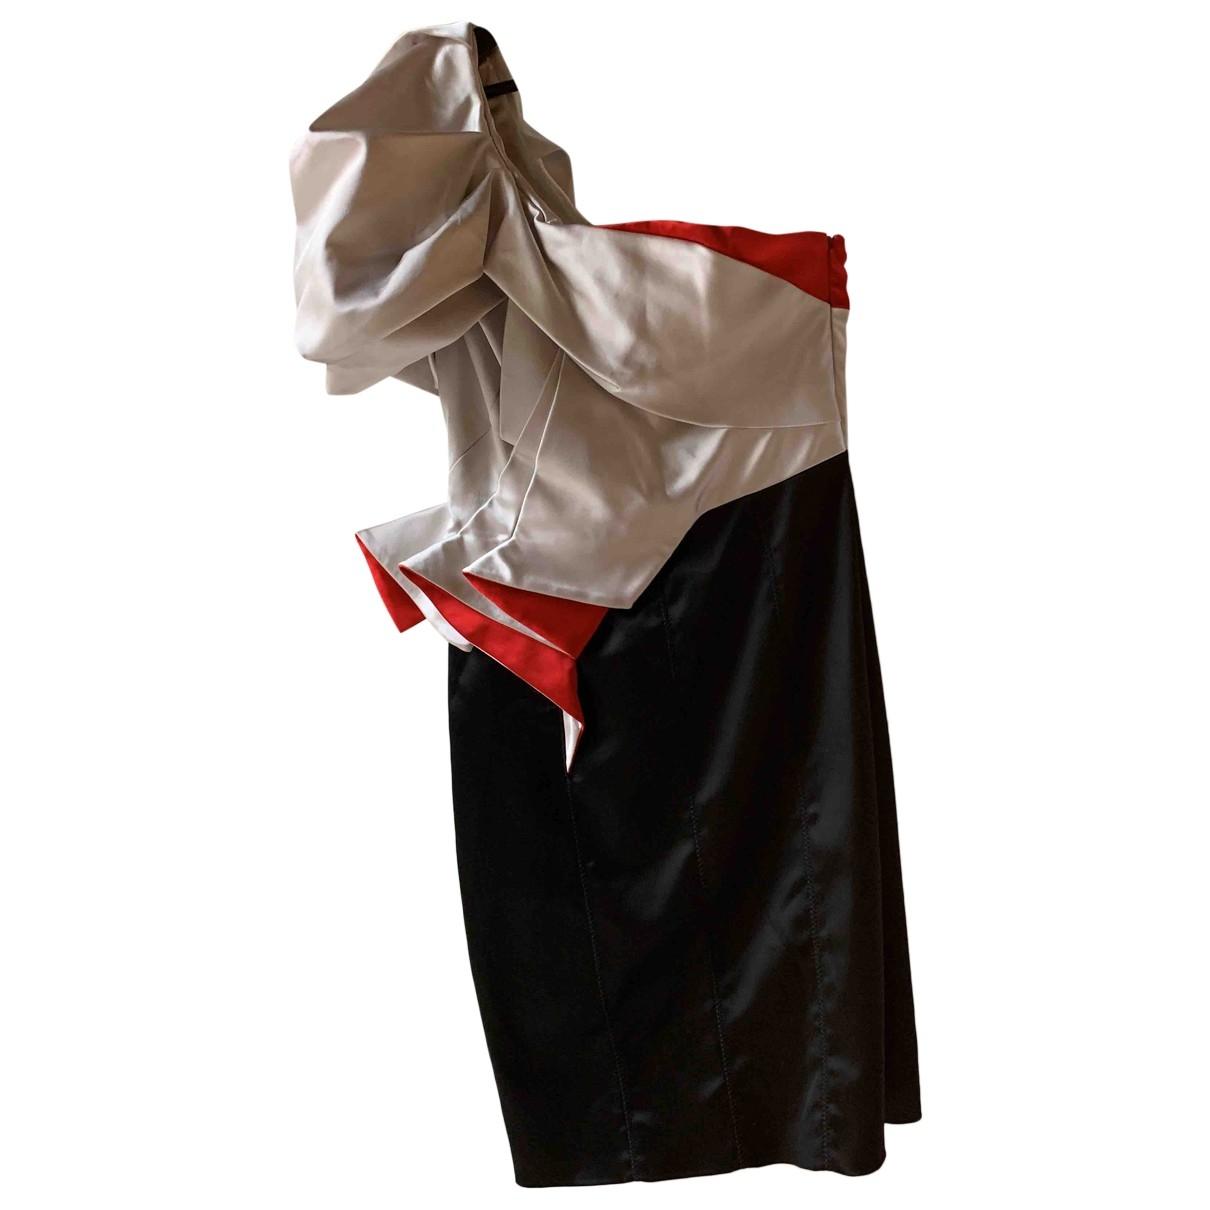 Karen Millen \N Ecru dress for Women 40 IT